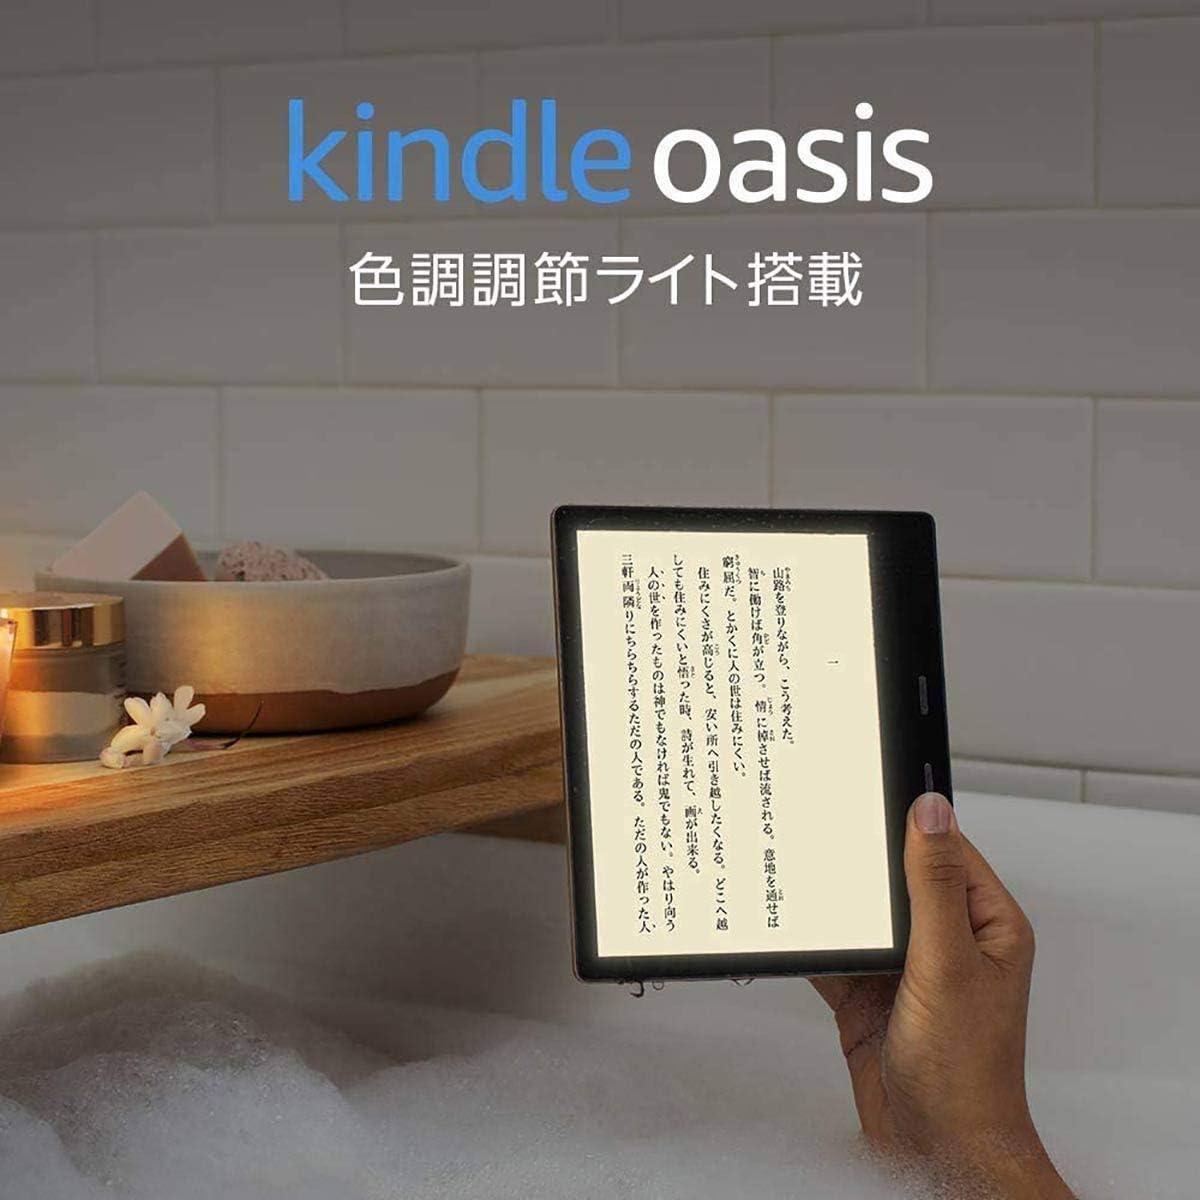 Kindle Oasis 色調調節ライト搭載 wifi 32GB 広告つき 電子書籍リーダー